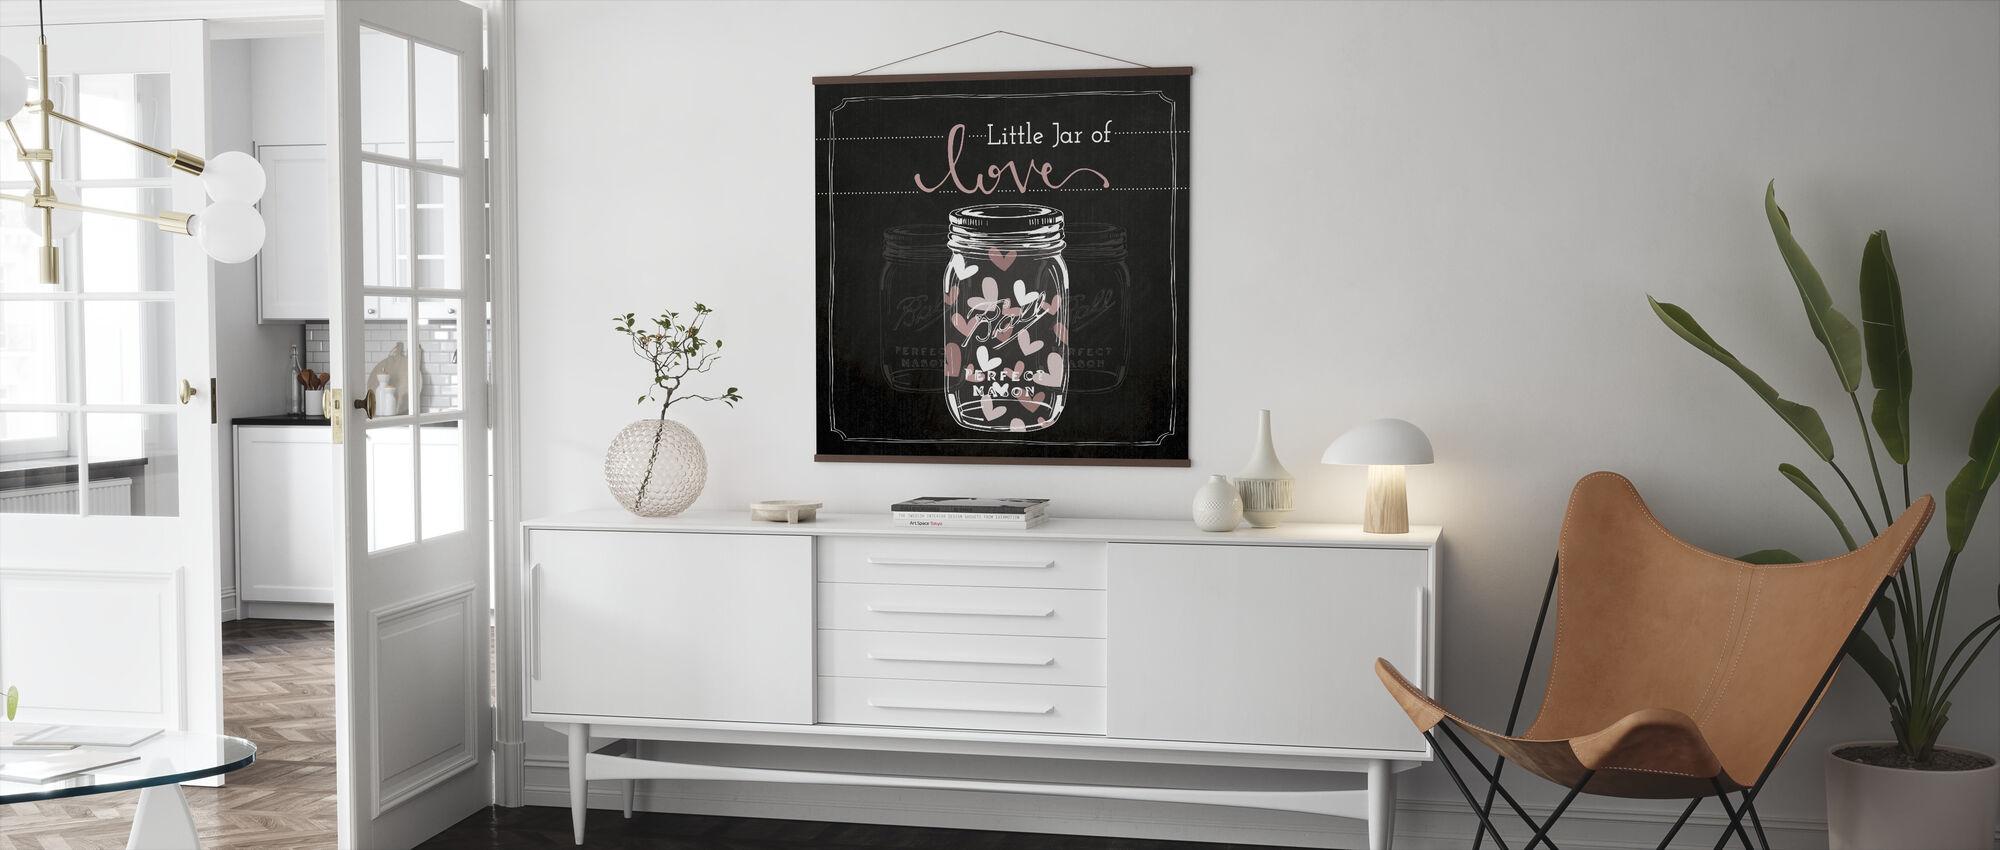 Kärlekens burk - Poster - Vardagsrum